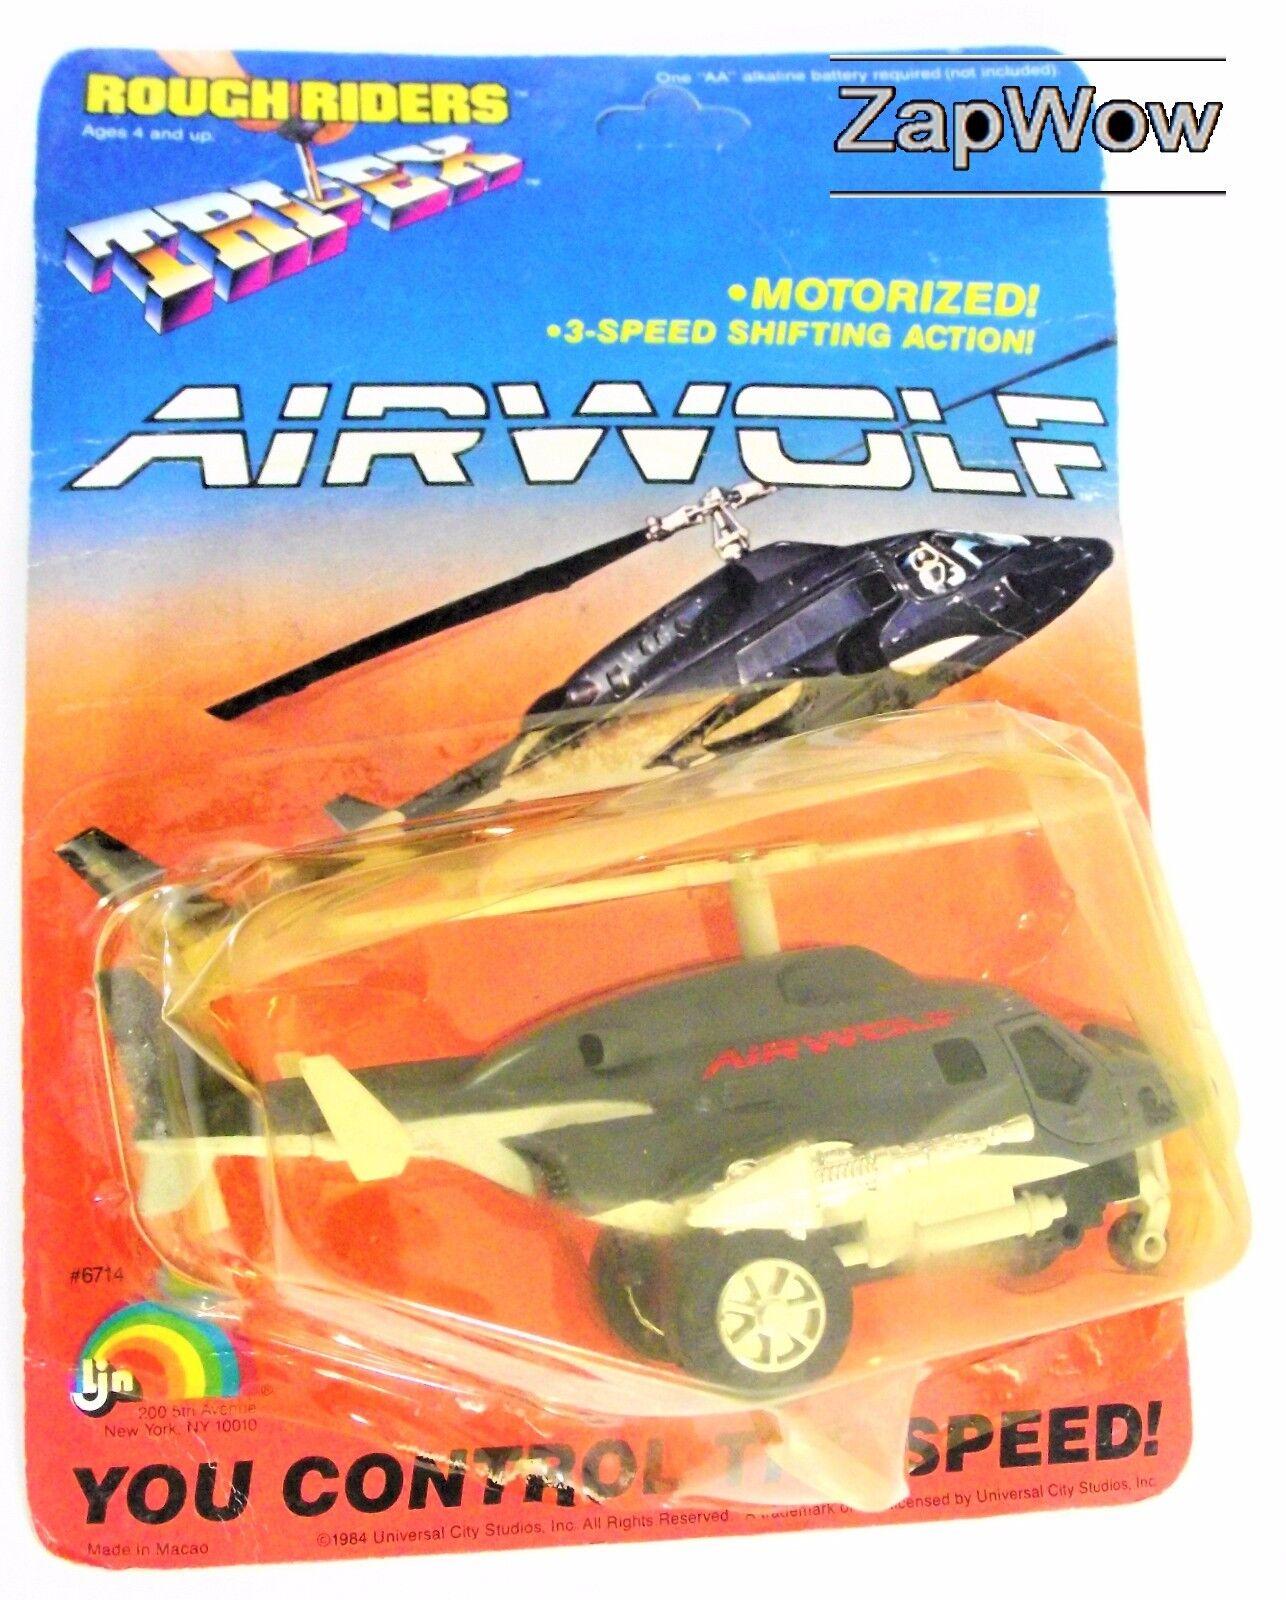 AIRWOLF 1984 Rough Riders Tri -Ex militär- Bell 222 Helikopter årgång TV MoC